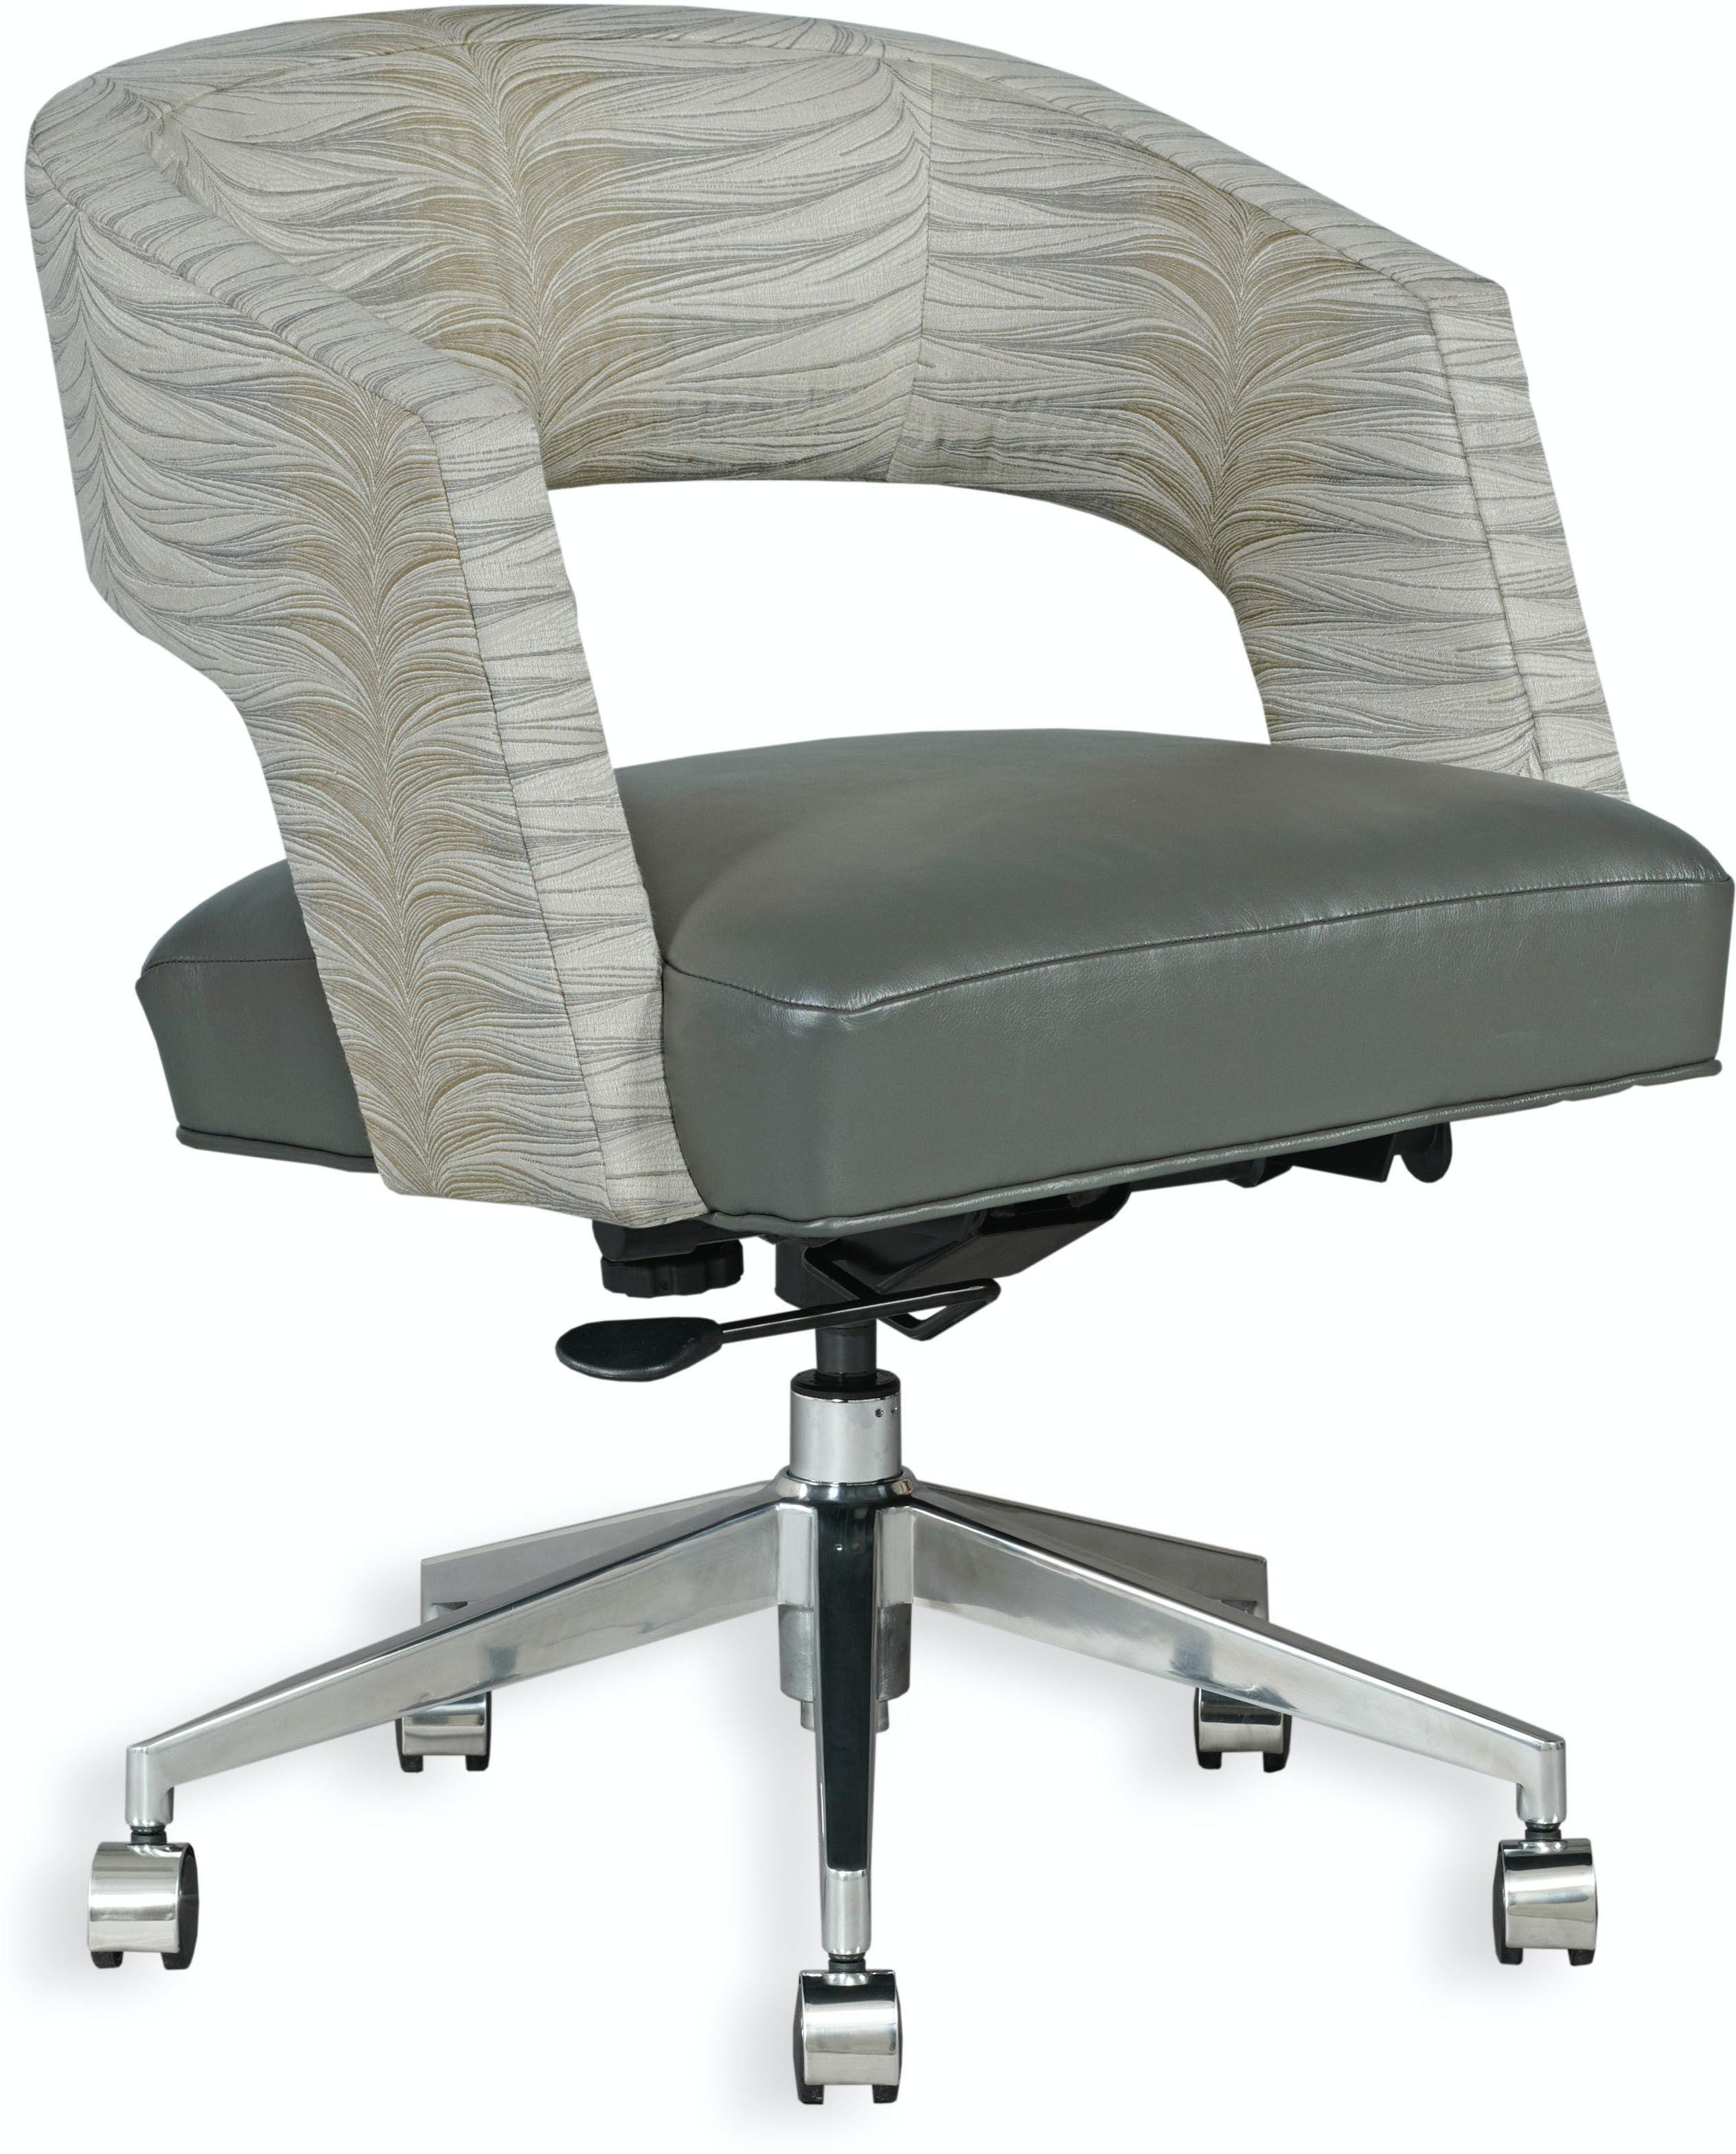 Fairfield Chair Company Home Office Bryant Task Chair 8794